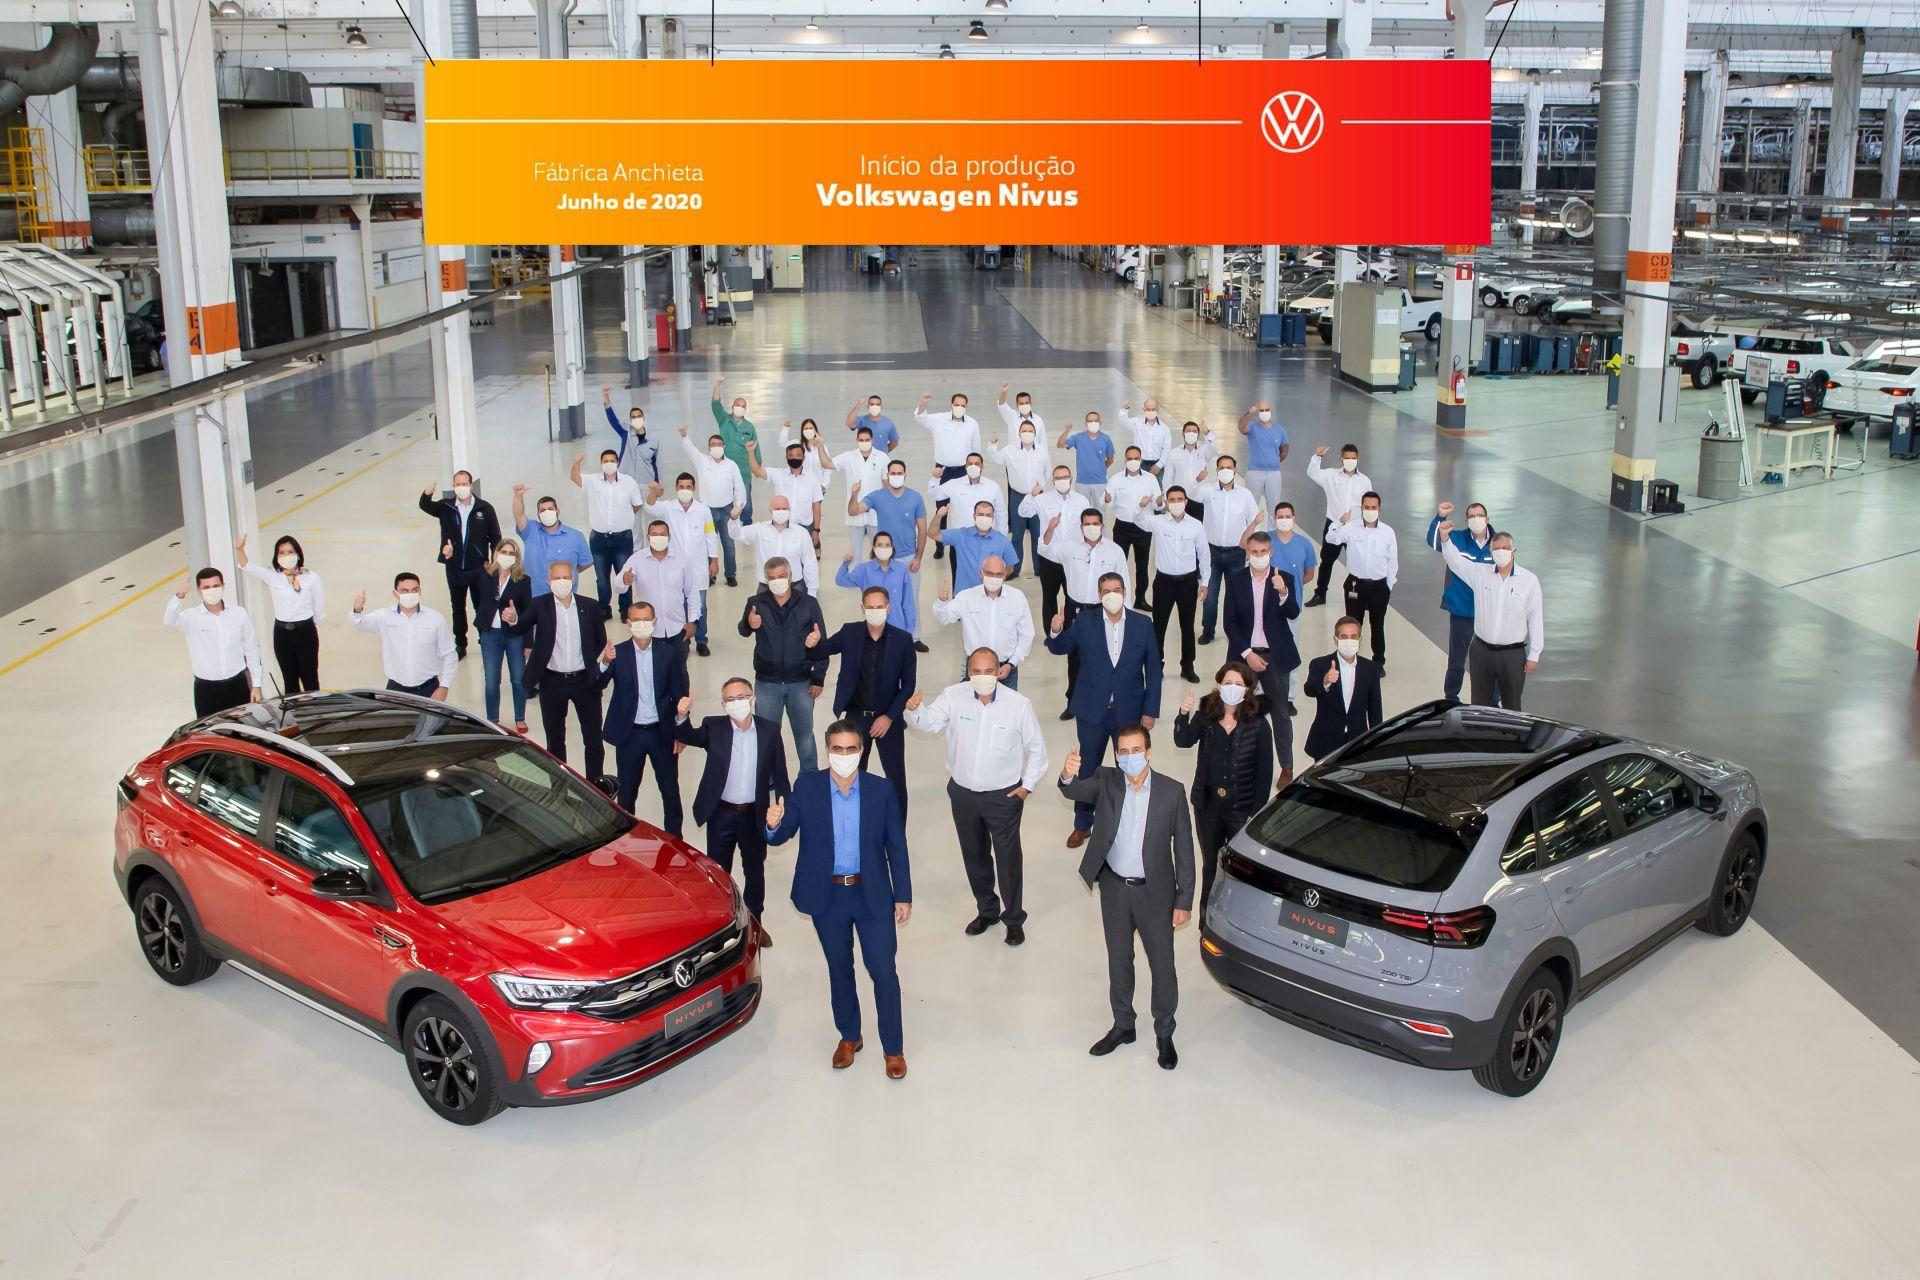 VW-Volkswagen-Nivus-plant-Brazil-1